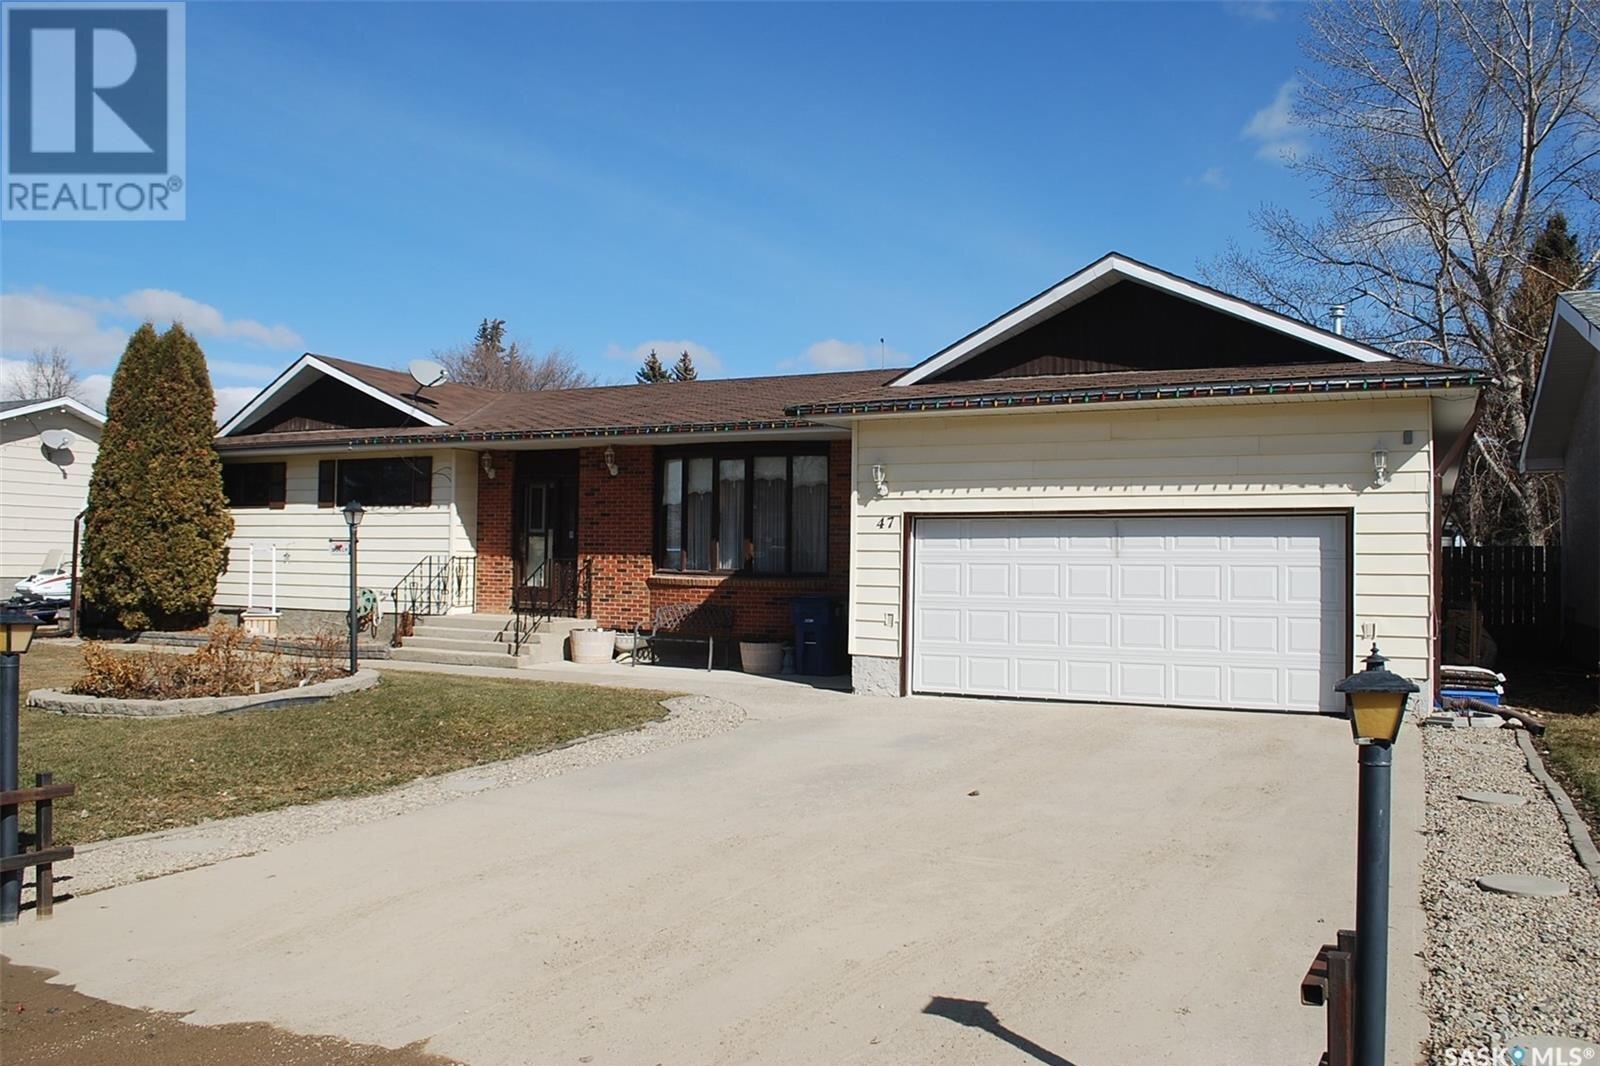 House for sale at 47 Aspen St Qu'appelle Saskatchewan - MLS: SK831219